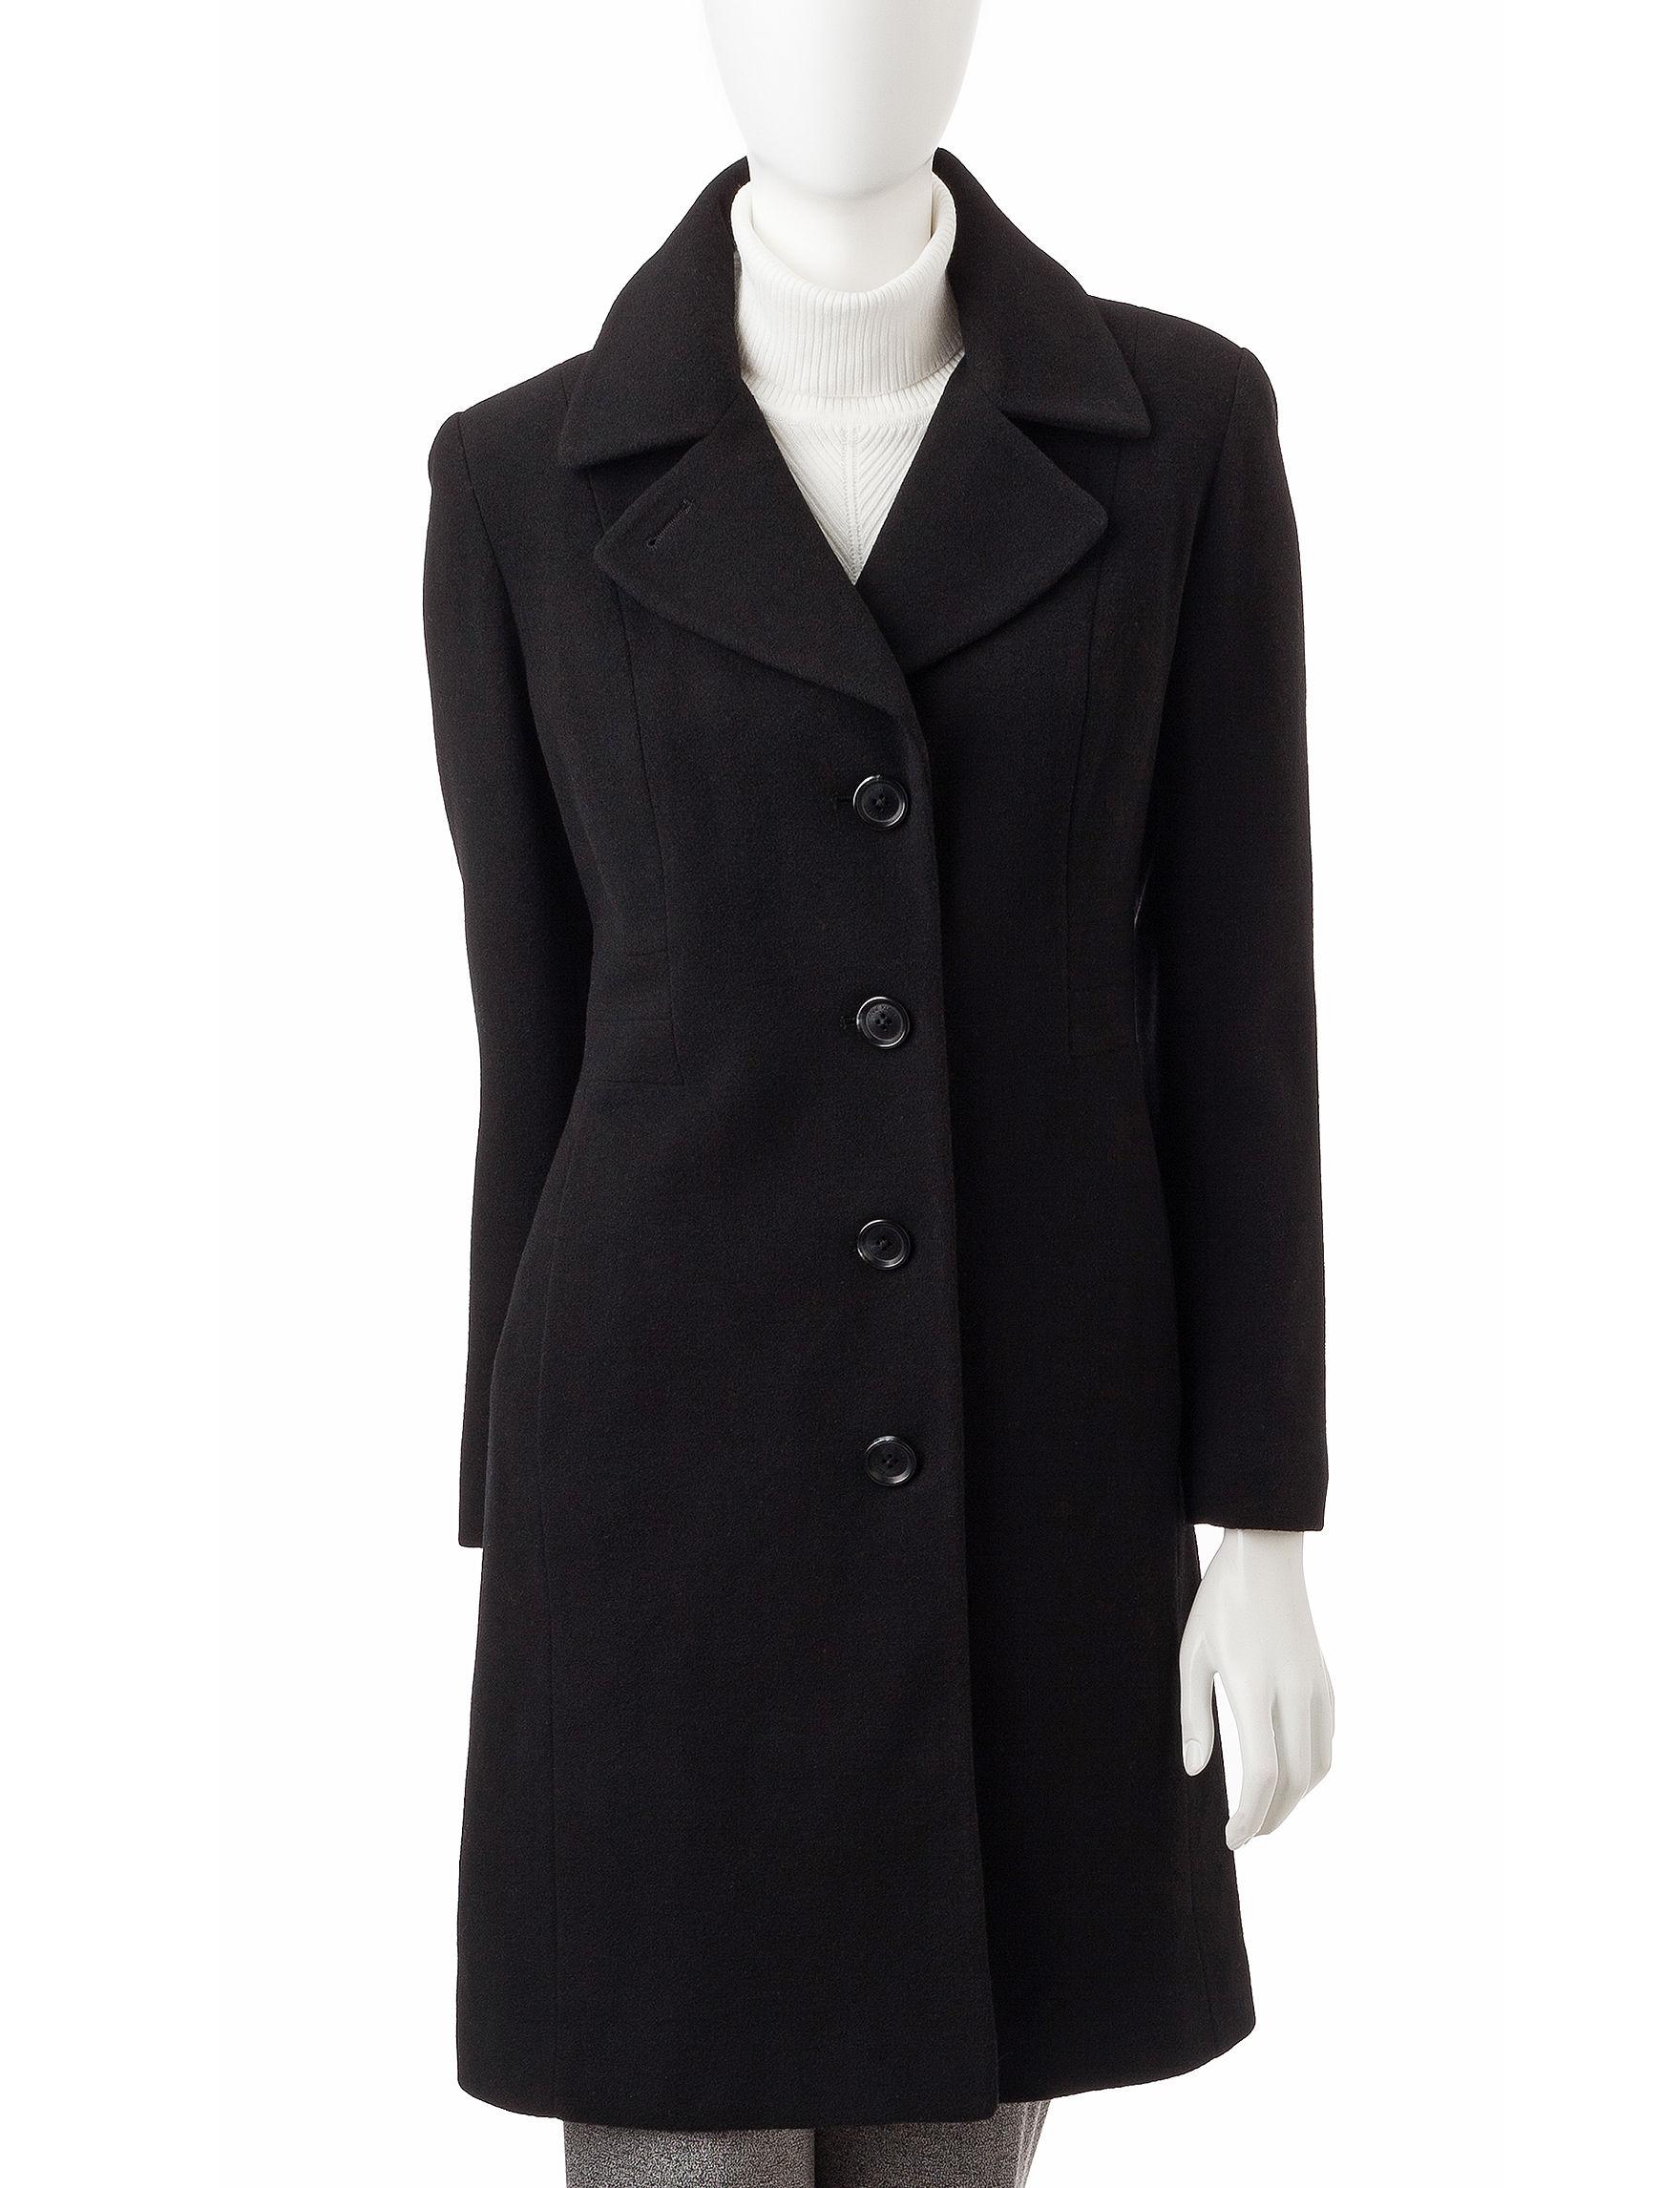 Anne Klein Black Peacoats & Overcoats